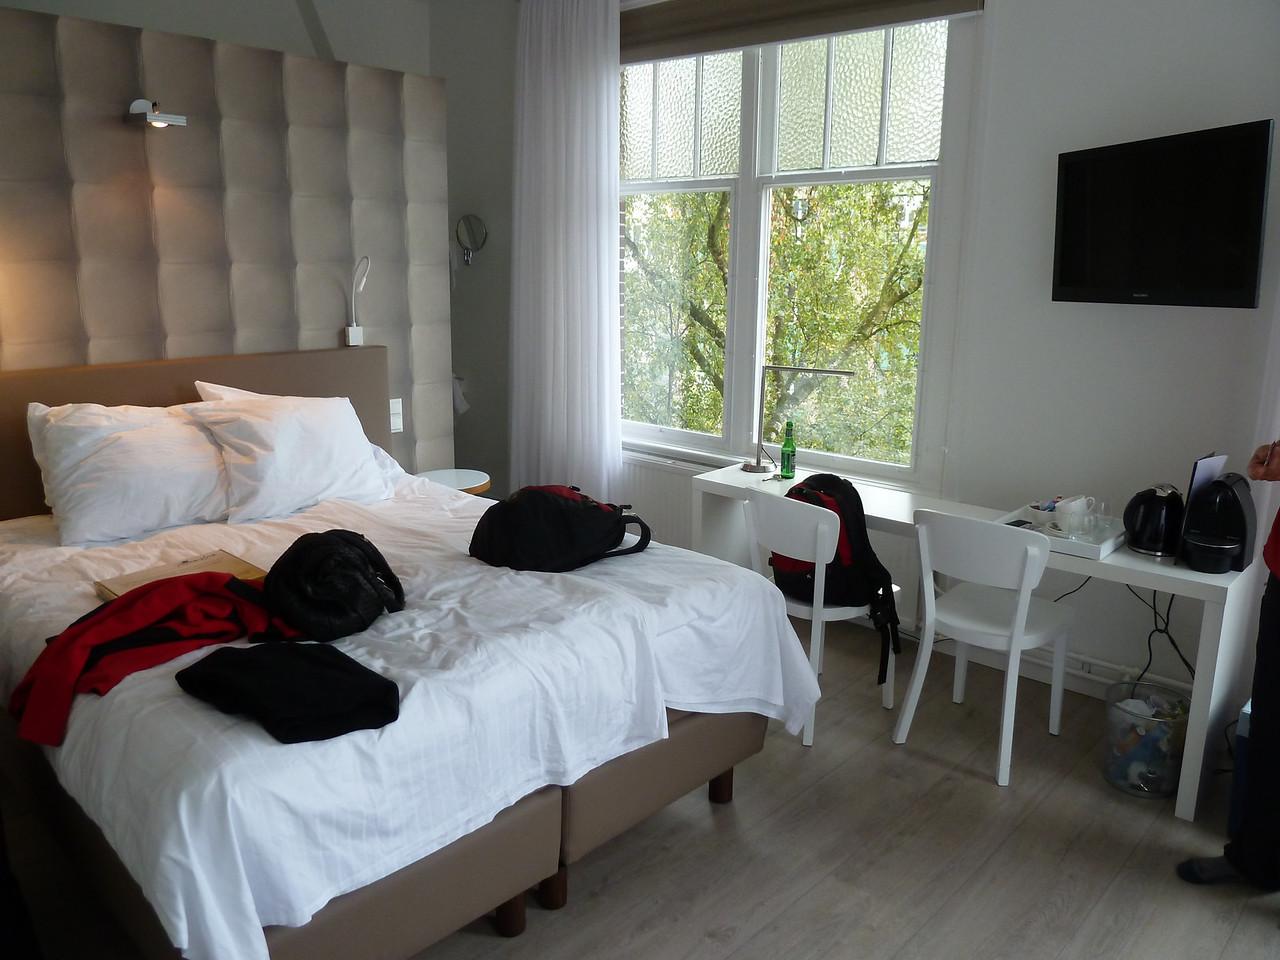 Our wonderful B B in Nijmegen - are real' treat!